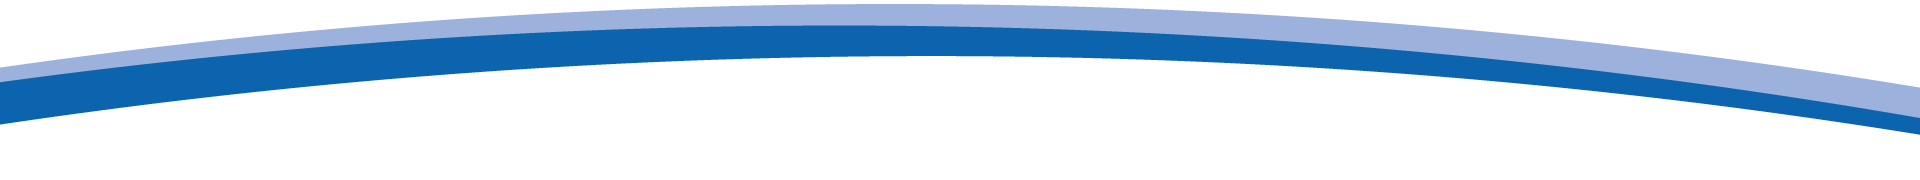 MORCEAU-SLIDER-HOT